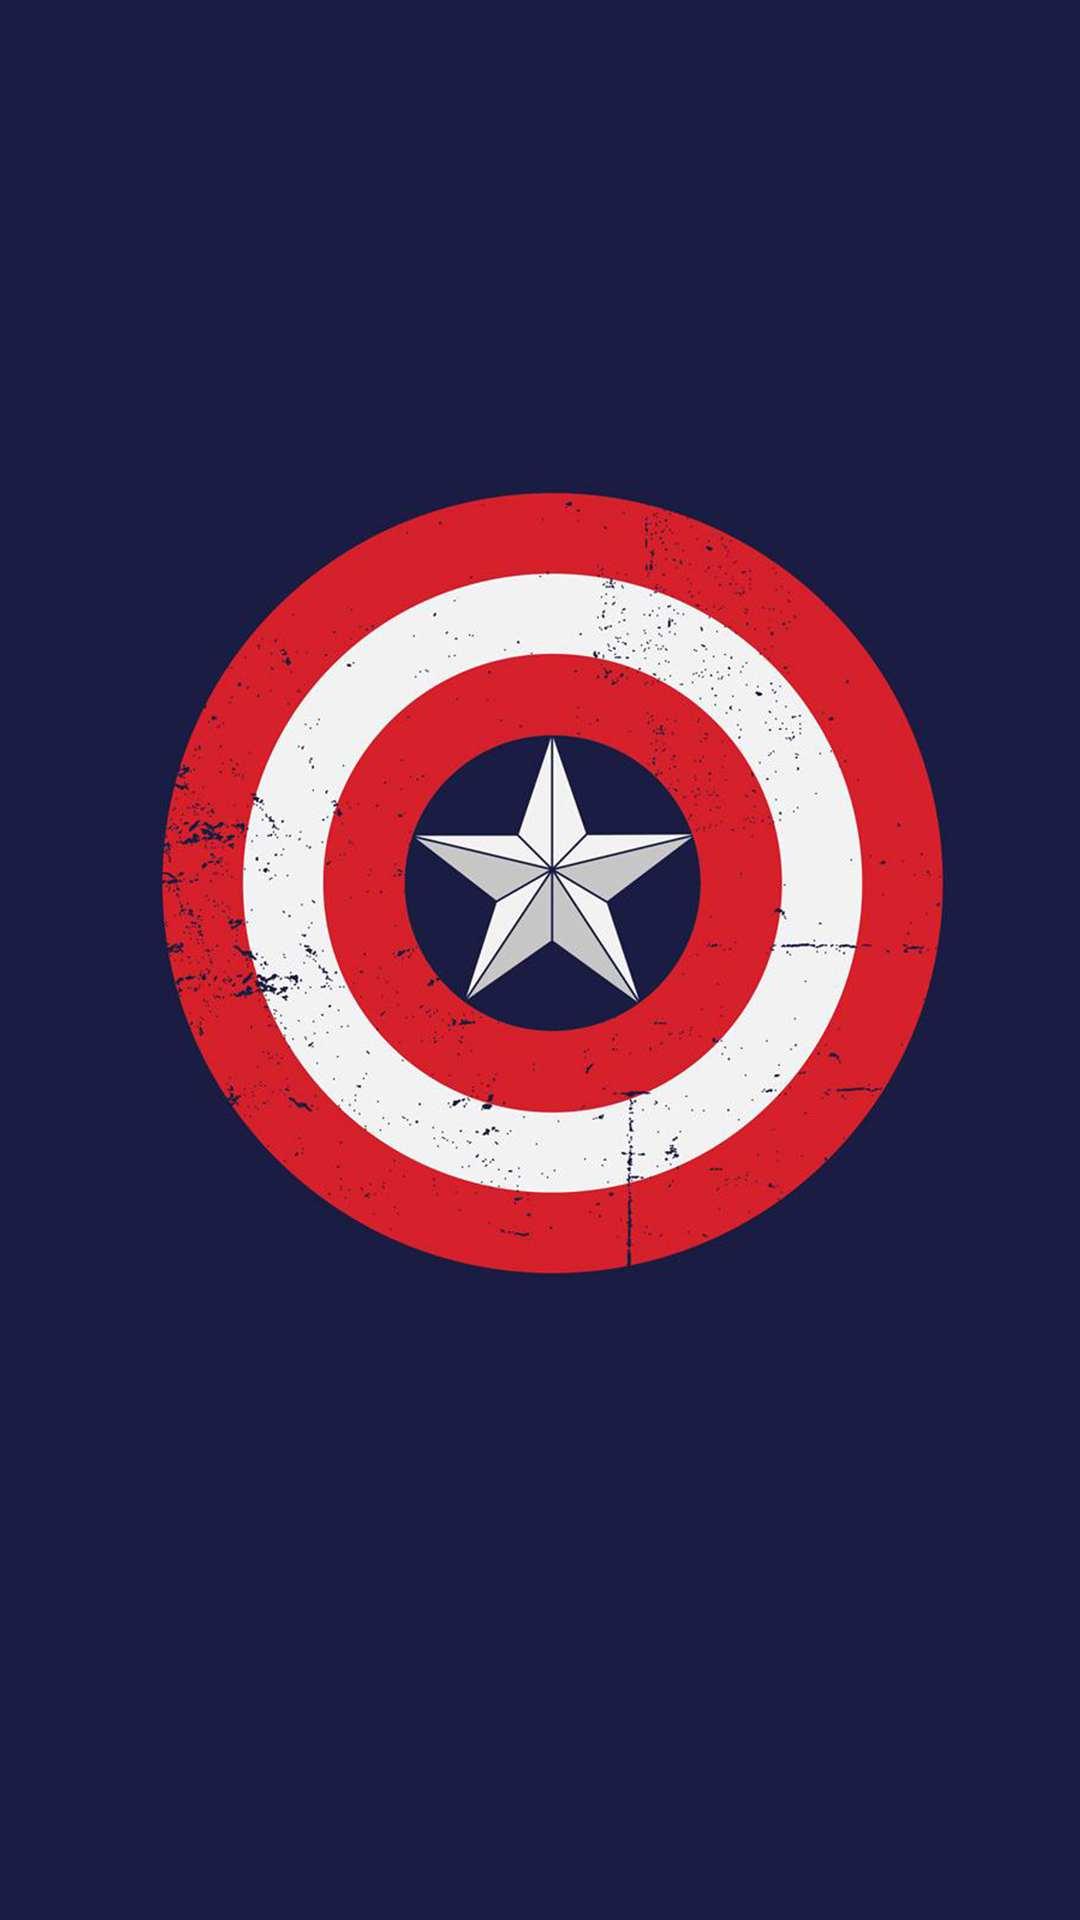 Computer Wallpaper Quotes Captain America Shield Minimal Iphone Wallpaper Iphone